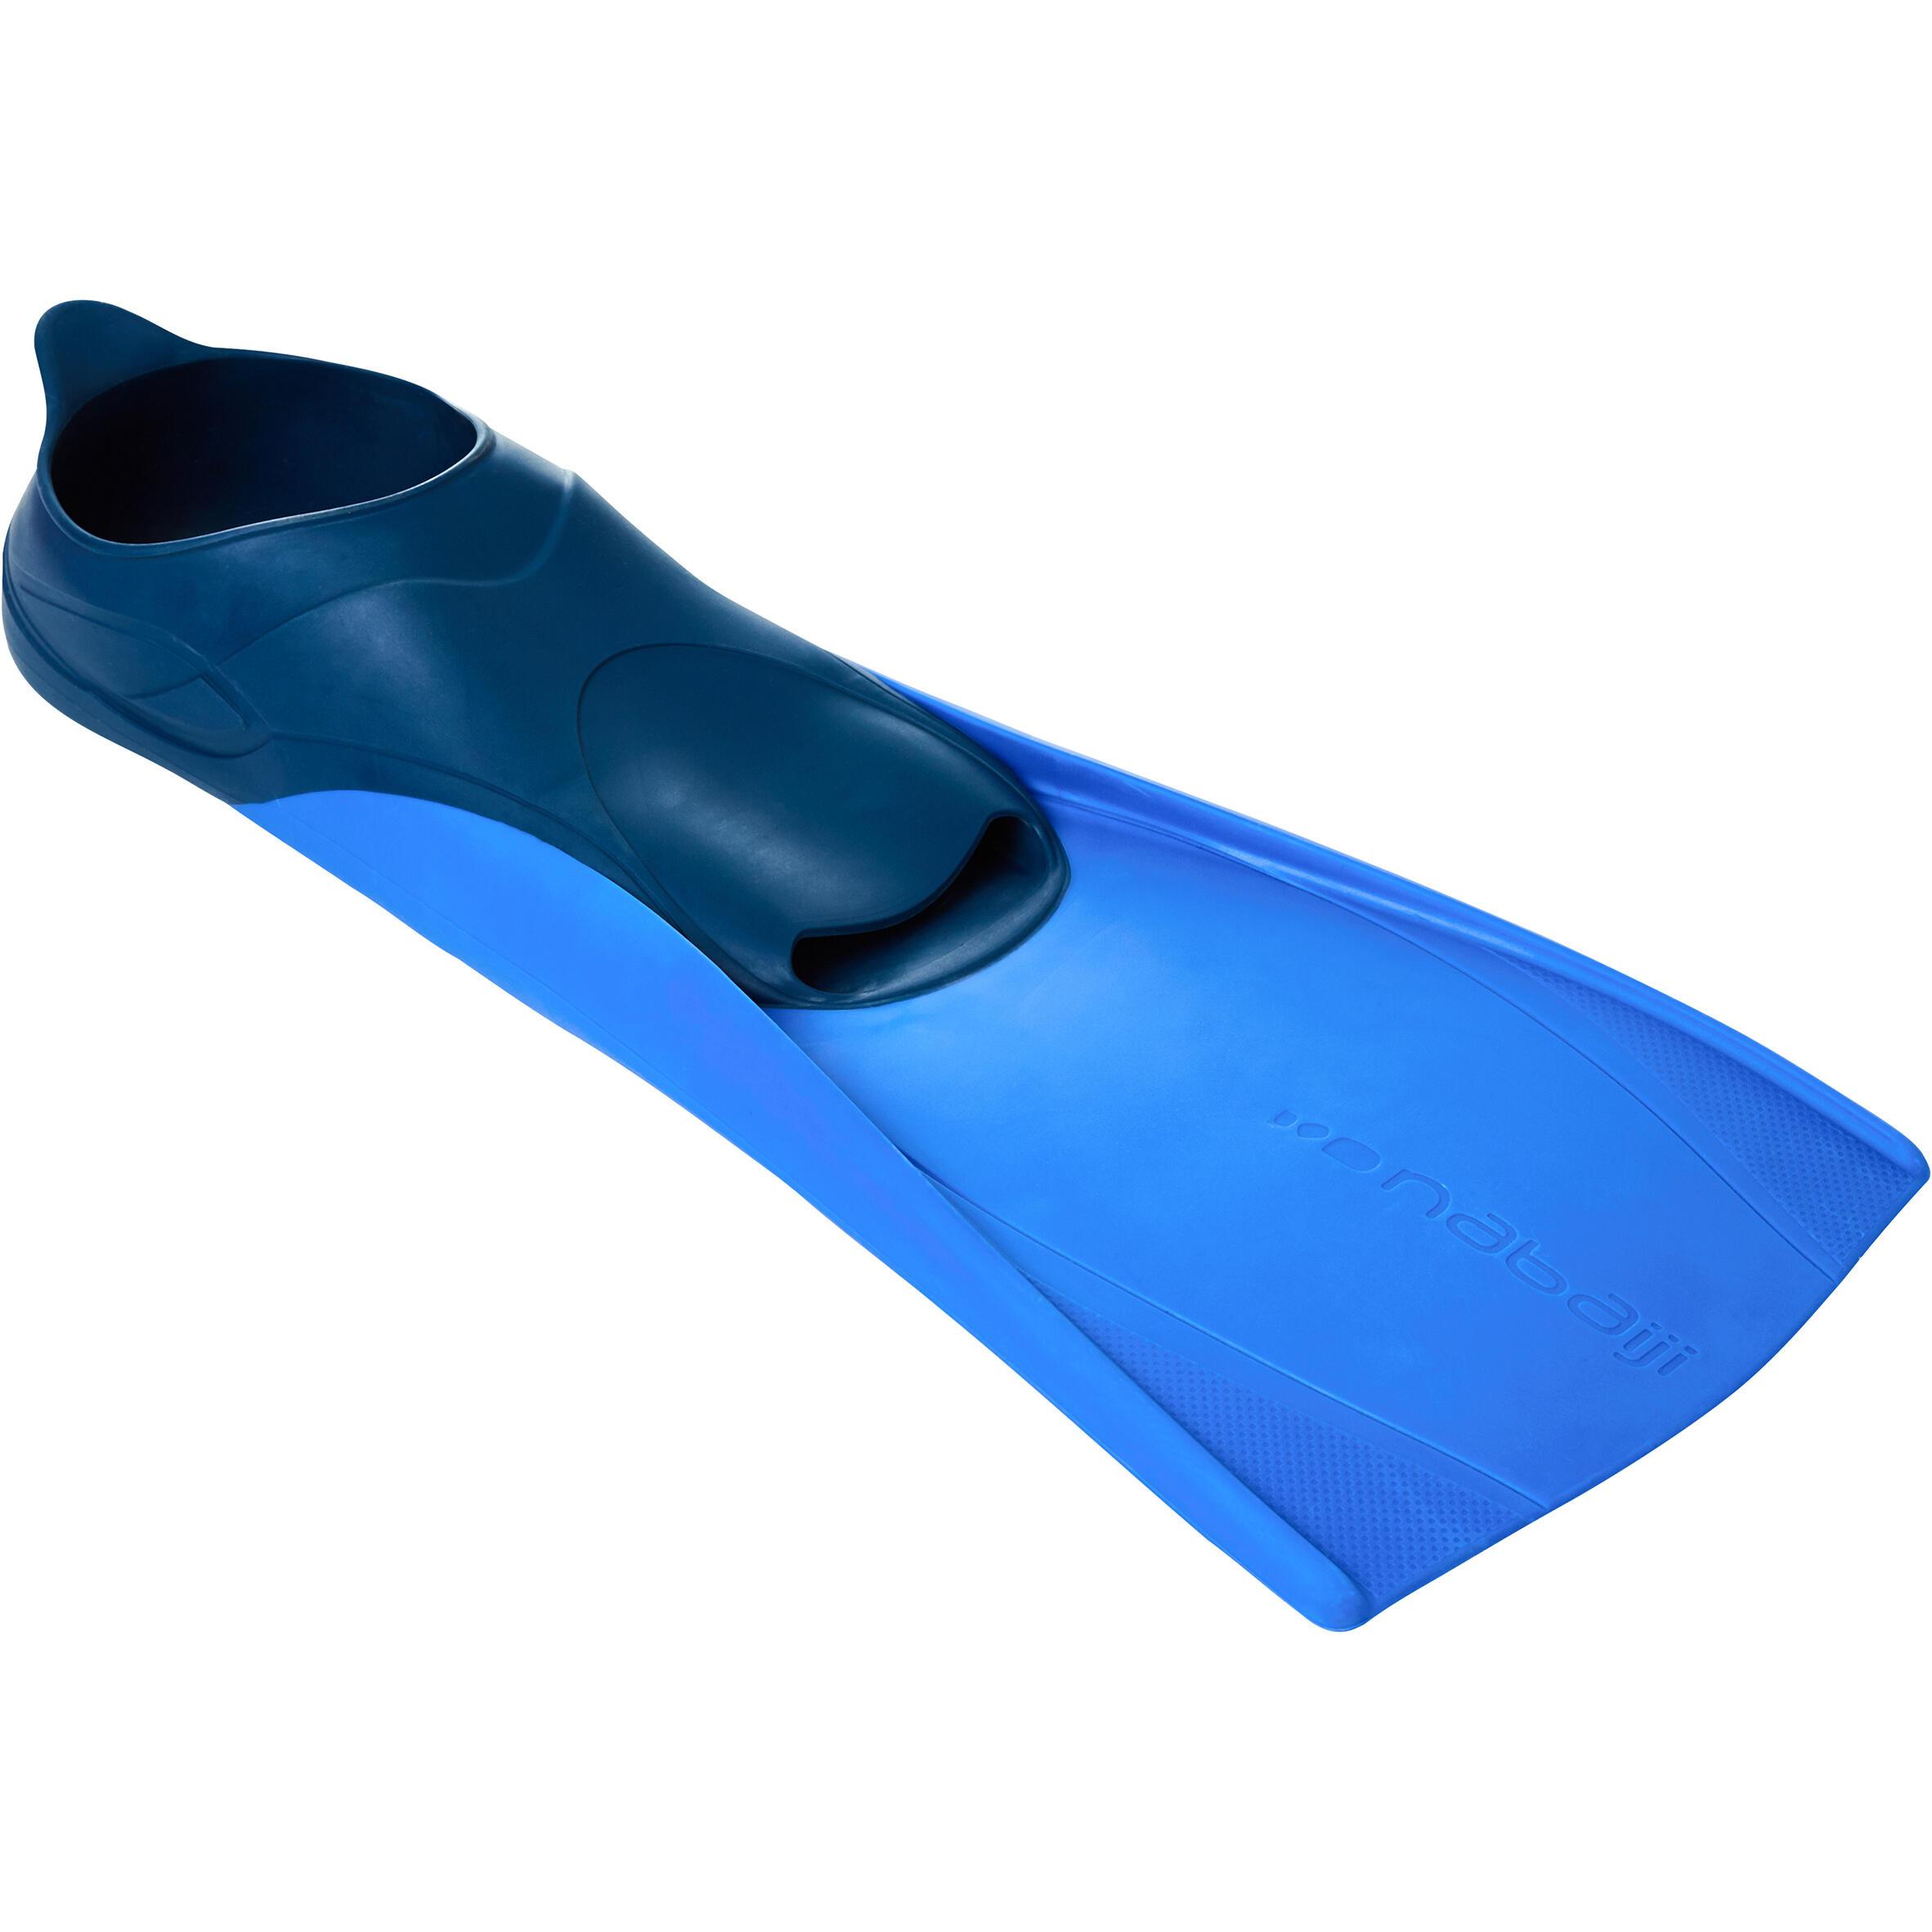 Trainfins Long Swim Fins - Dark Blue Blue